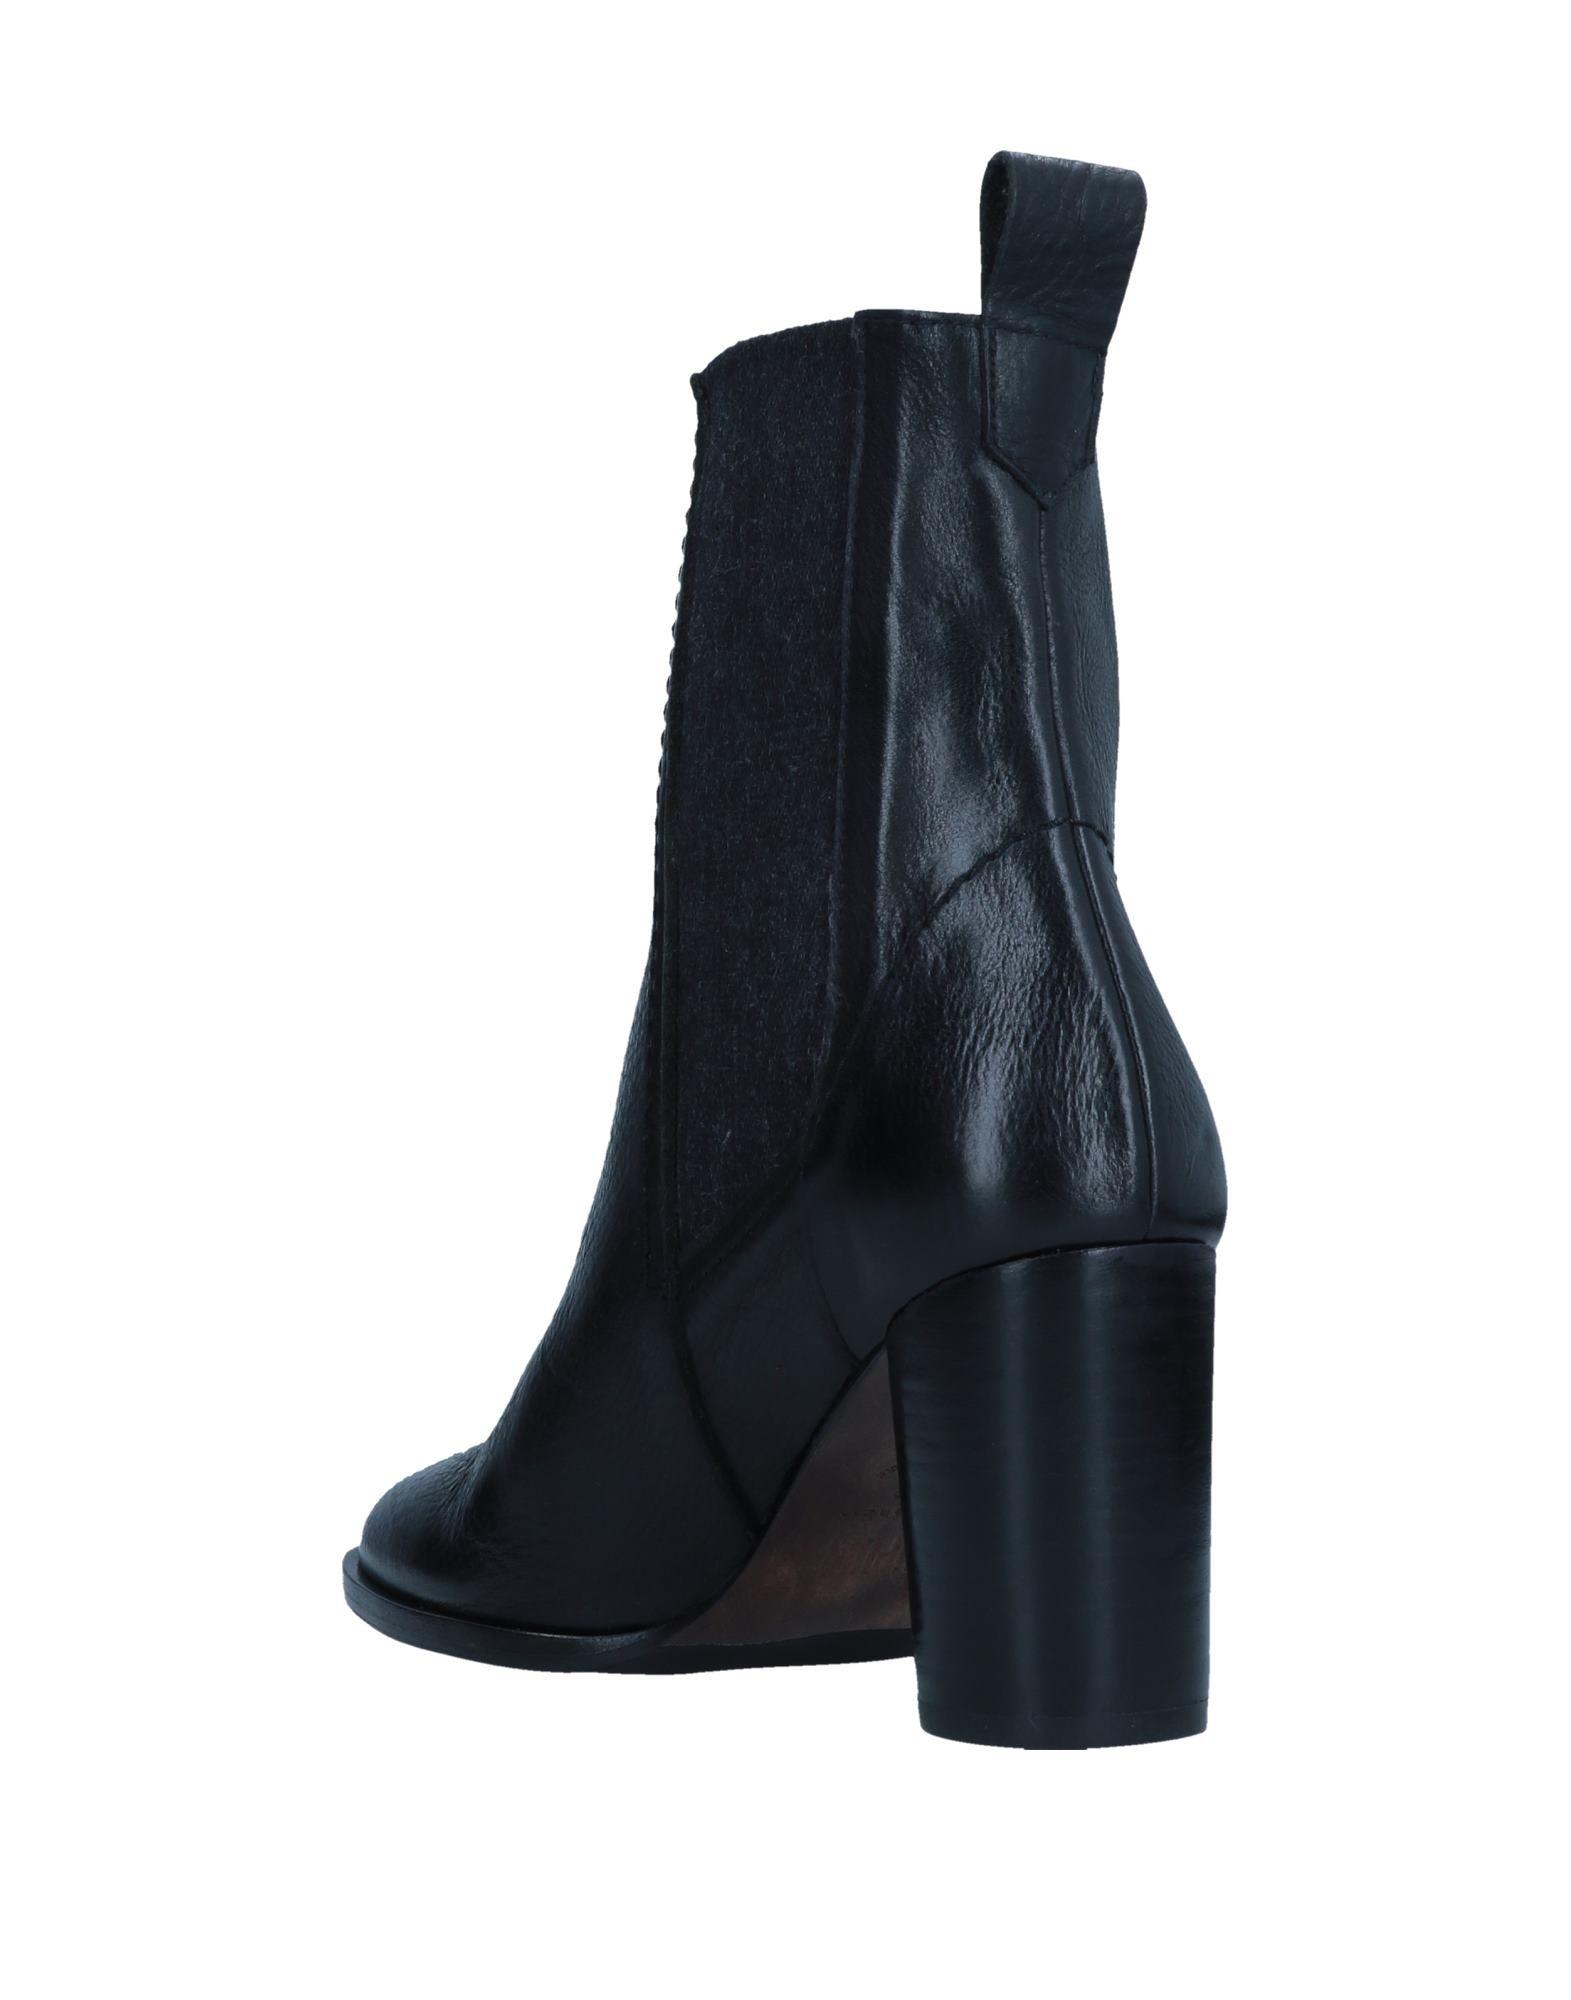 Stilvolle Chelsea billige Schuhe Anaid Kupuri Chelsea Stilvolle Boots Damen  11552635XG b638ed